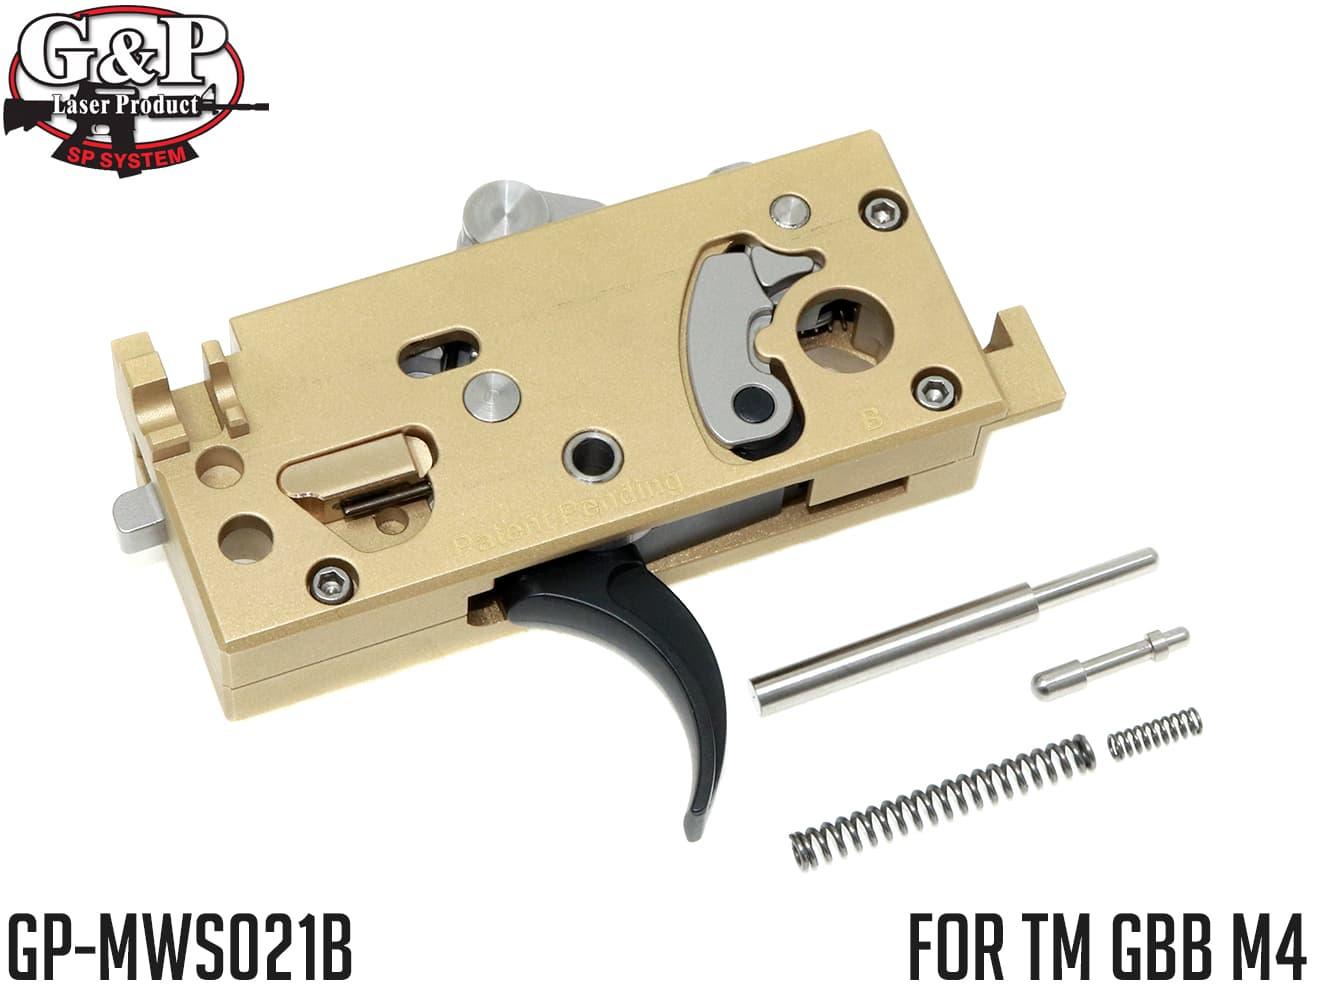 G&P CNC アジャスタブルトリガーボックス TM GBB M4◆マルイ GBB M4 調整式トリガー&調整式ハンマースプリング 独自機構 トリガーフレーム